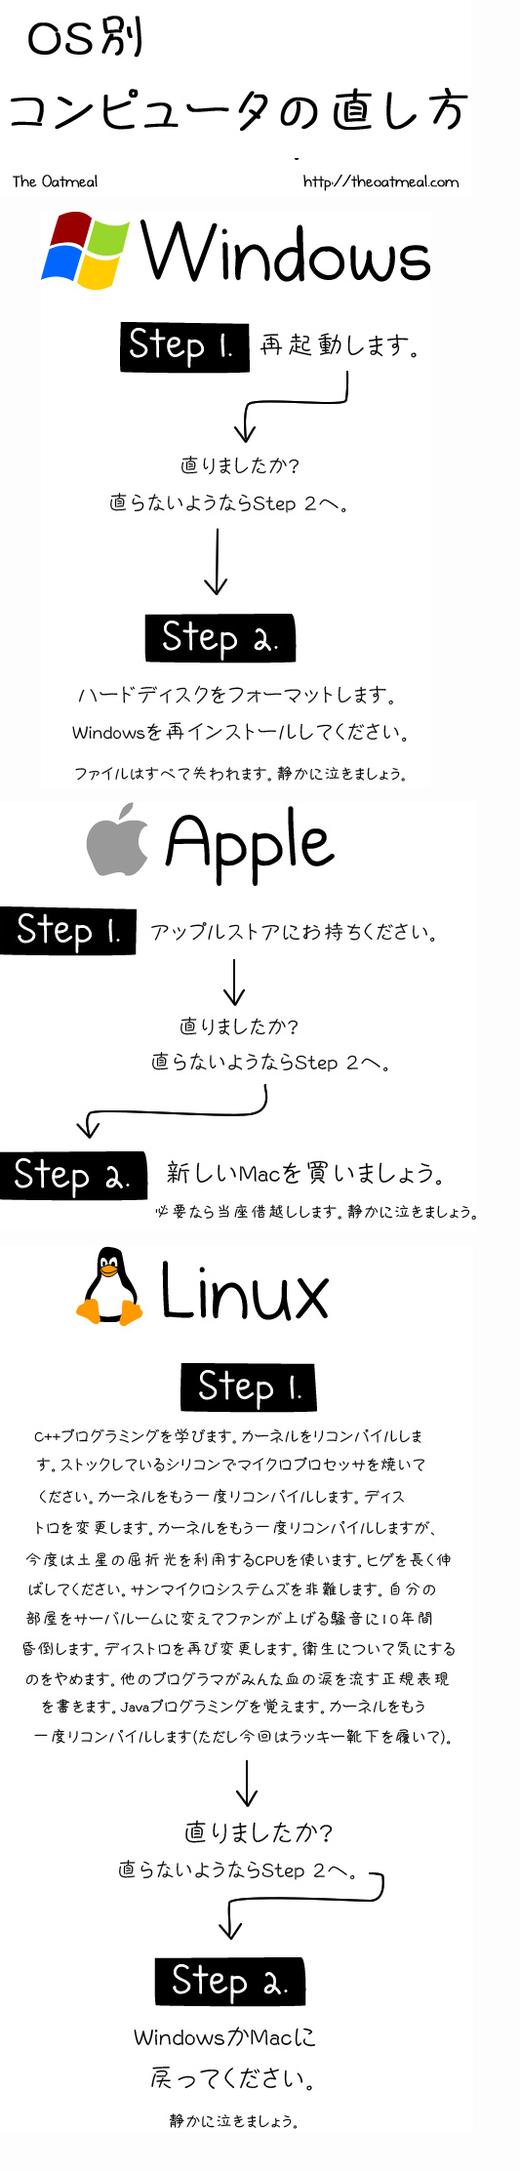 OS別コンピュータの直し方